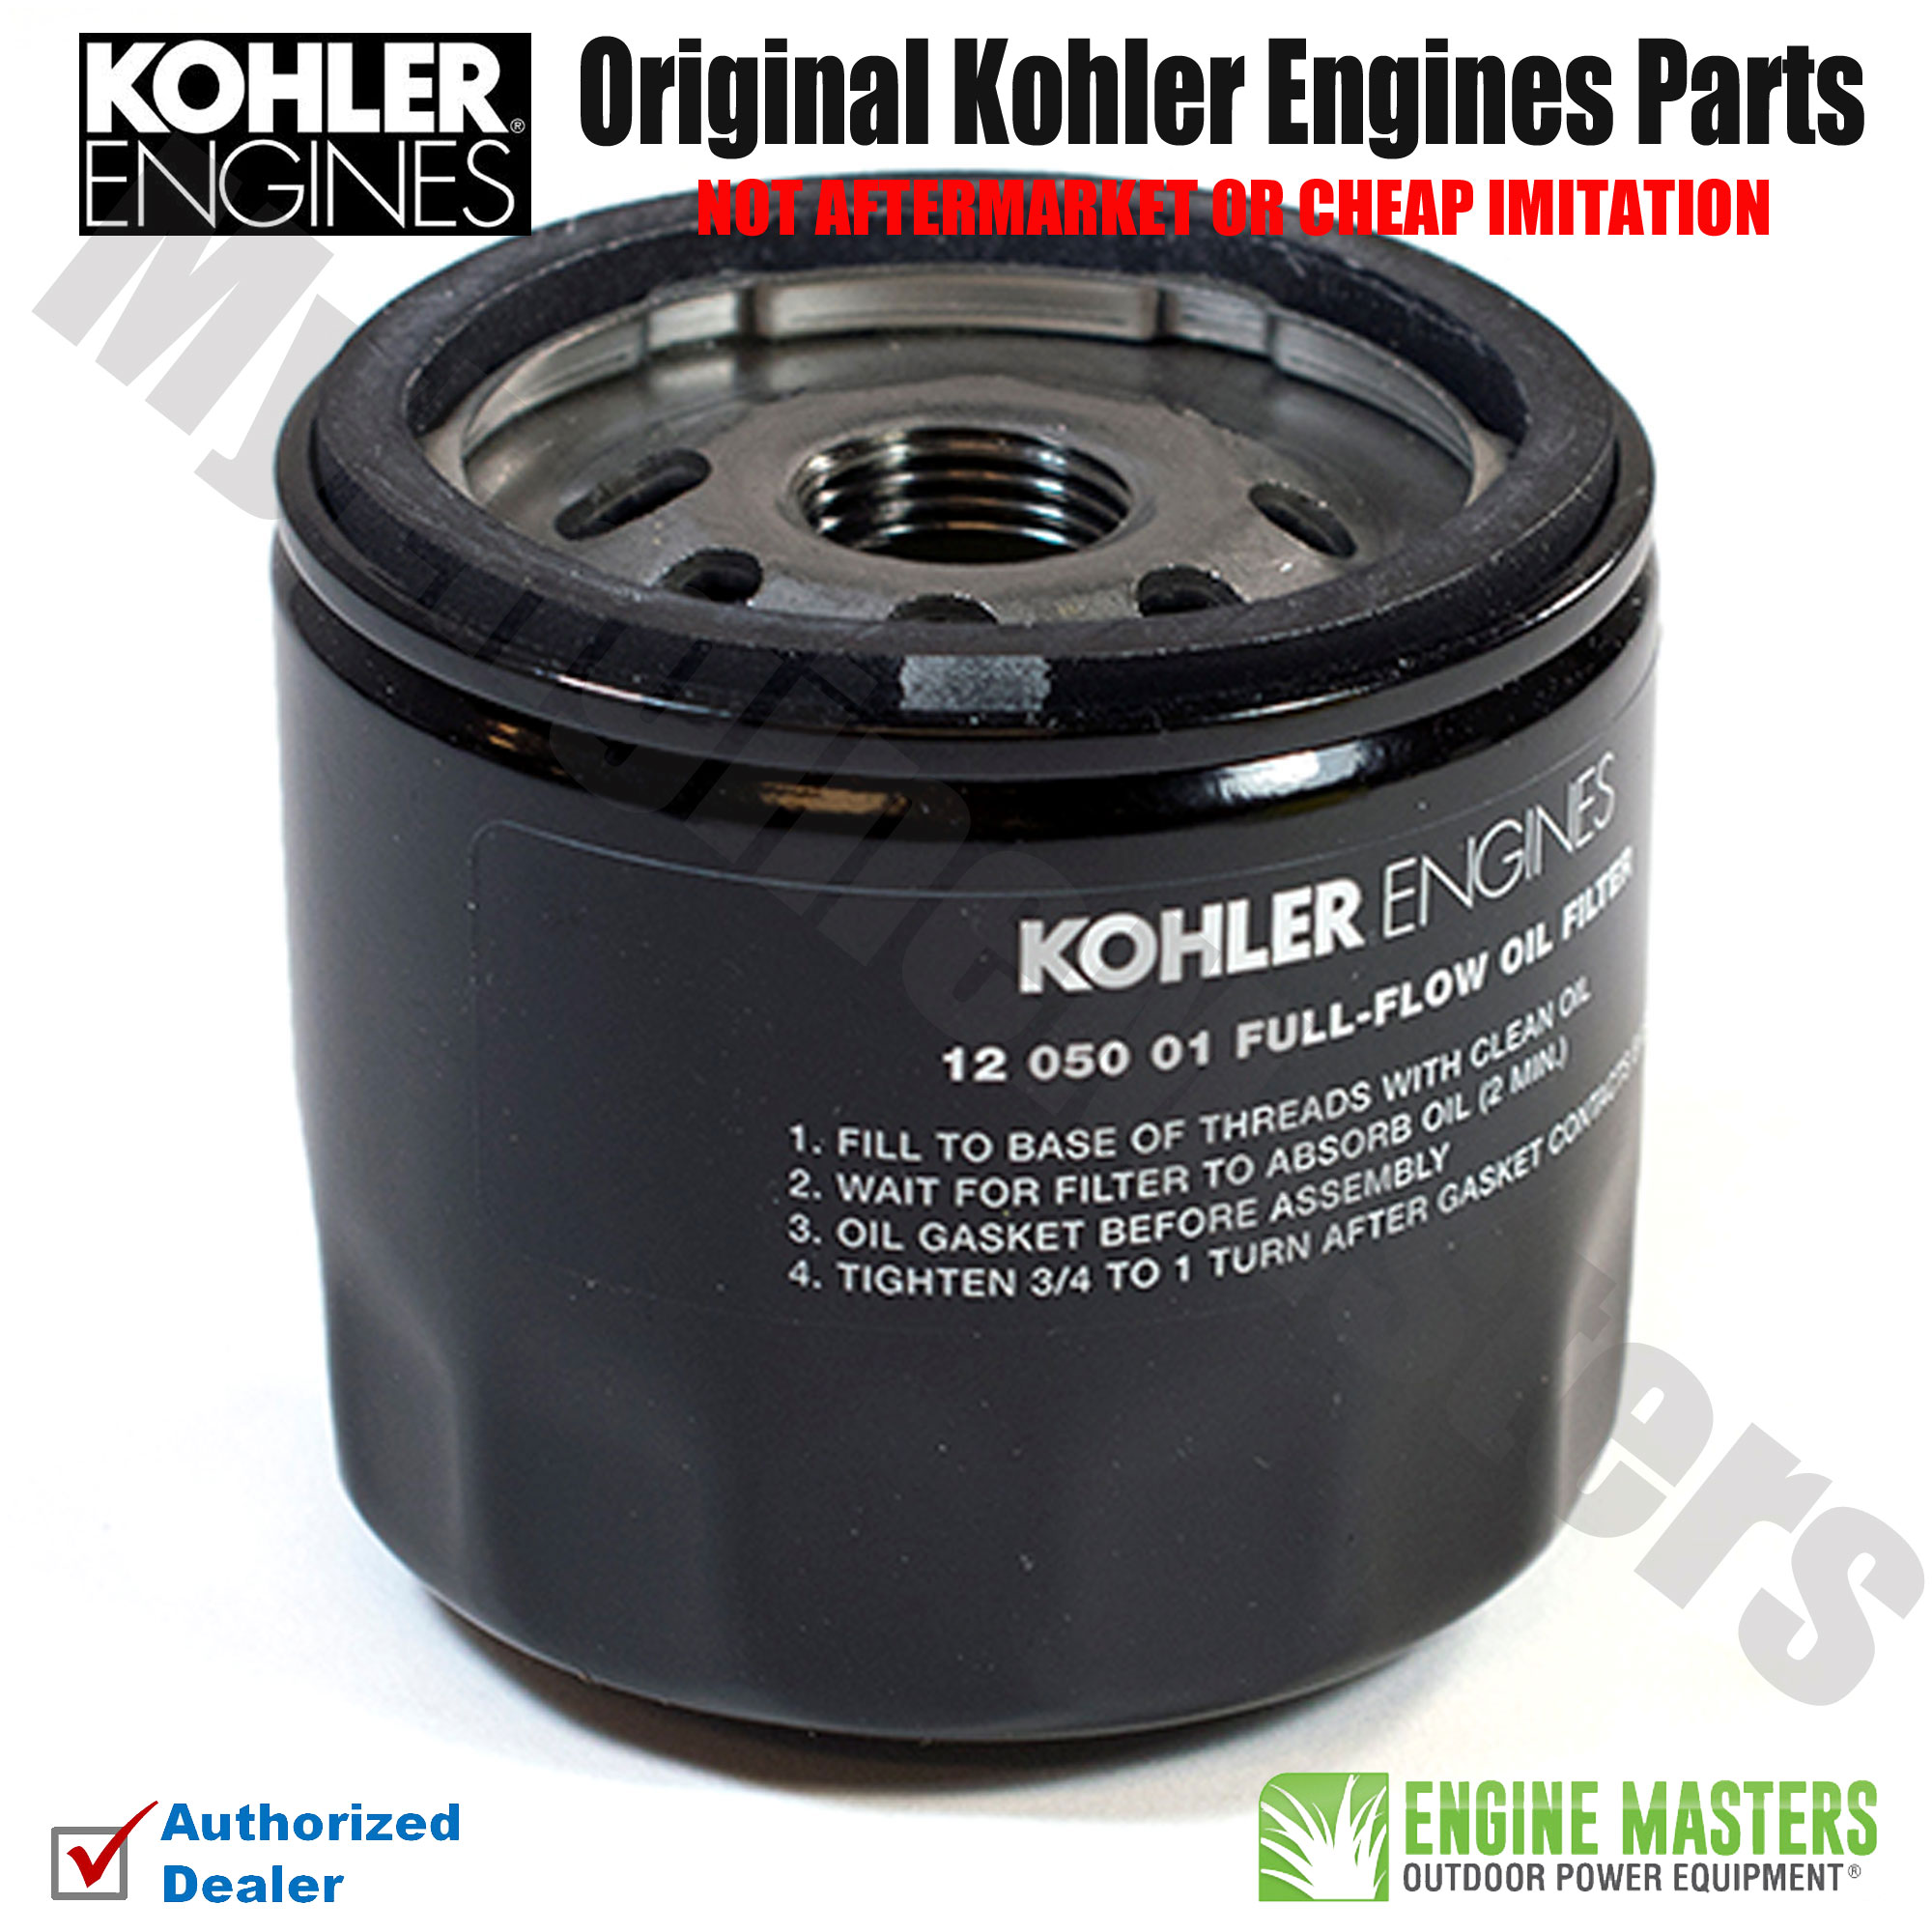 6 Pack Replacement Oil Filter for Kohler 12-050-01 12-050-01-S 1205001 1205001S